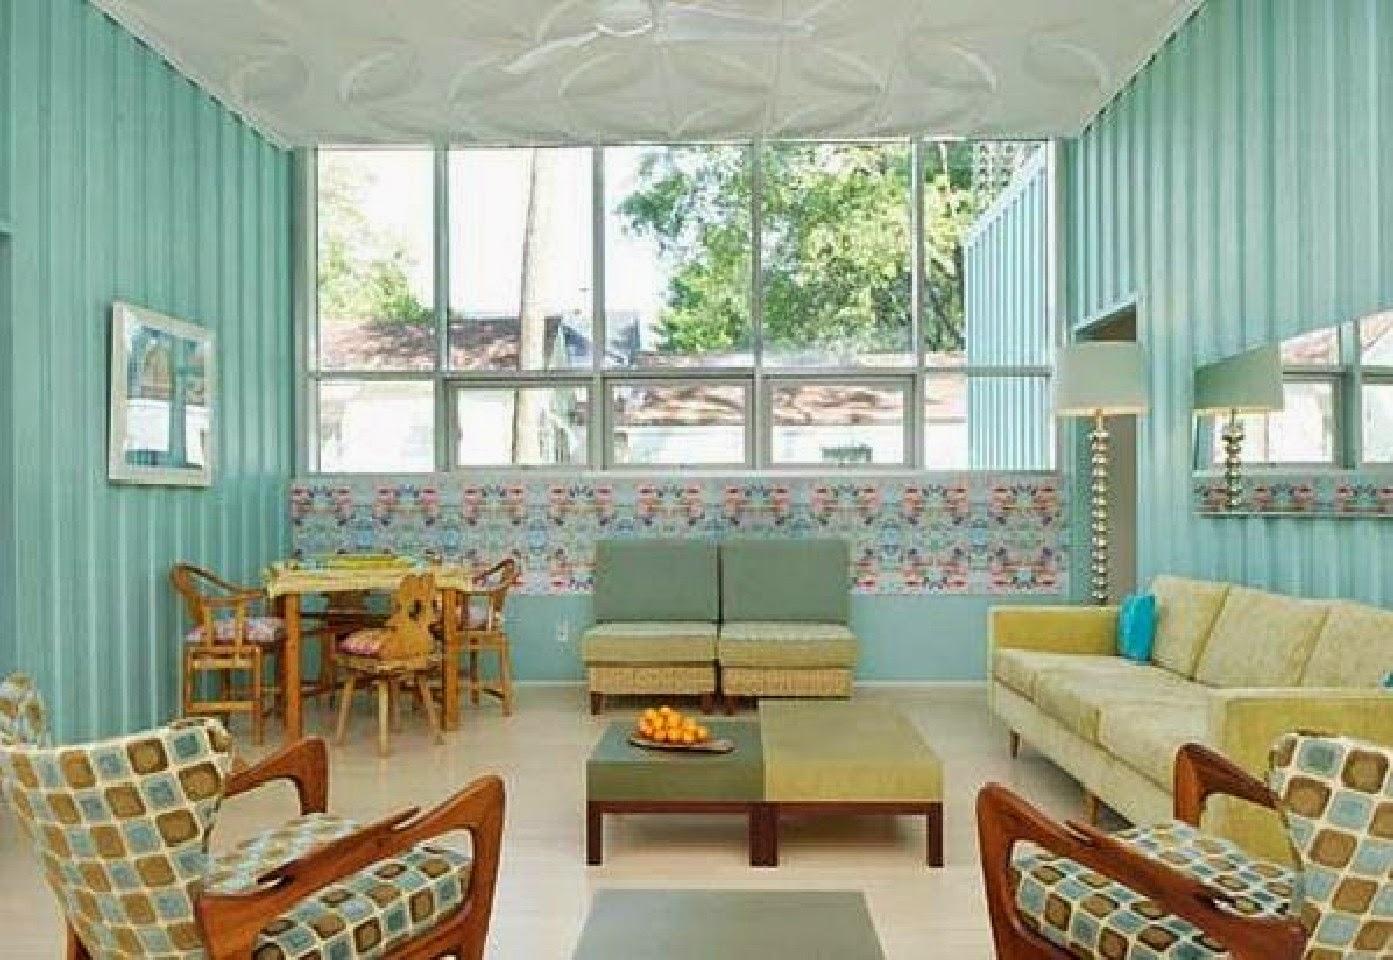 unique picture  Unique Containers Home Interior Design